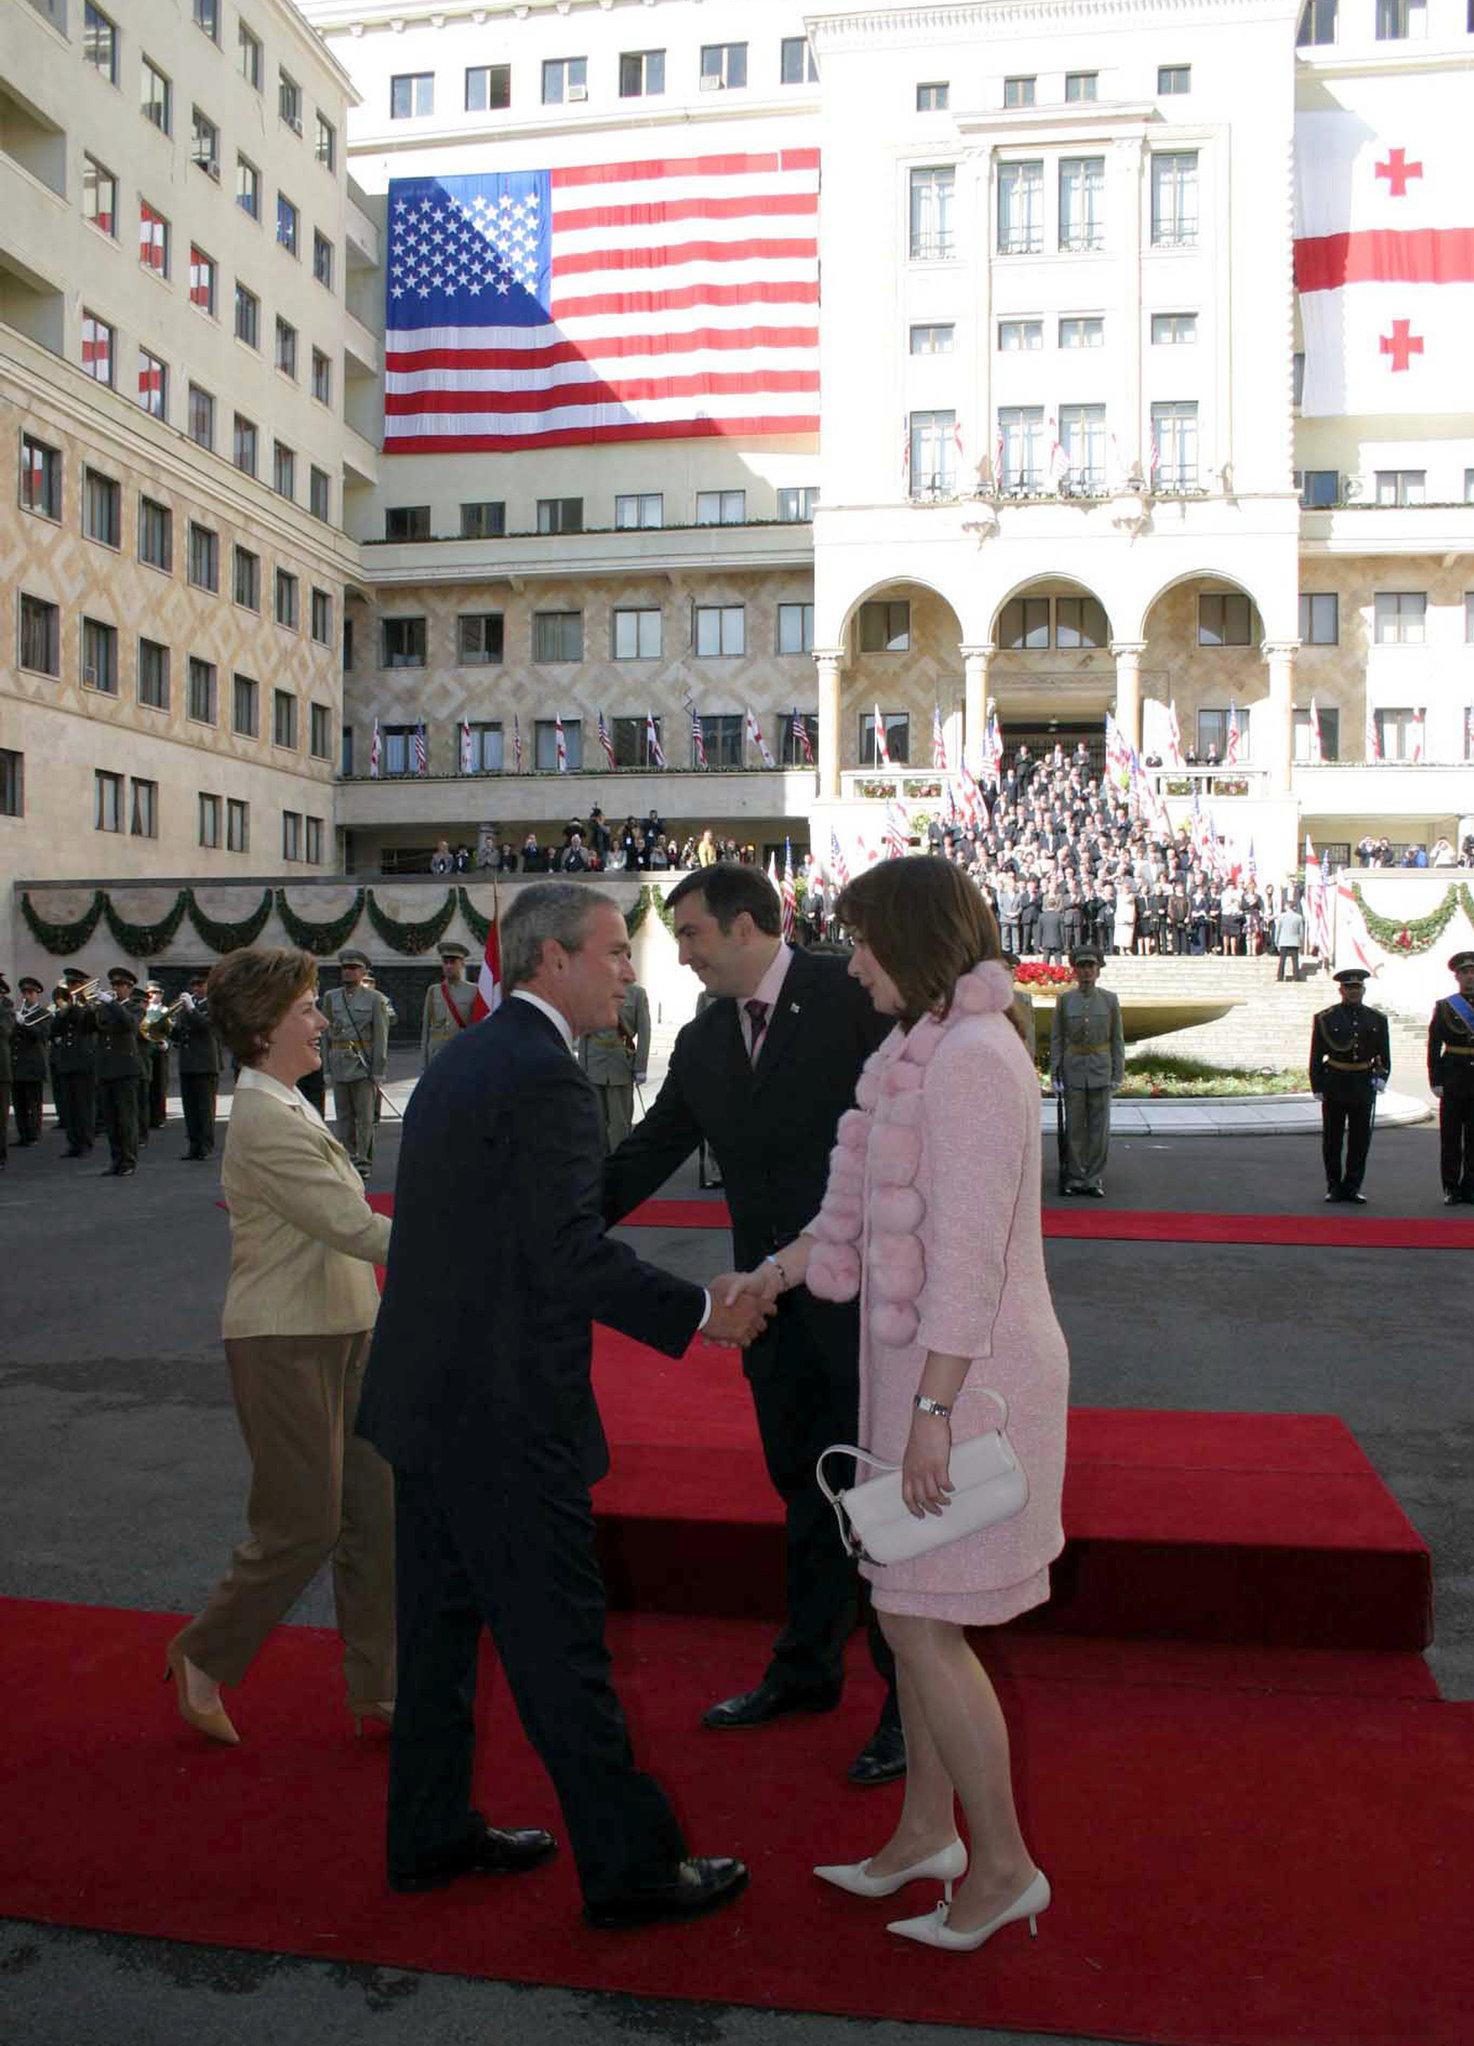 Лора Буш, президенты США Джордж Буш, Грузии Михаил Саакашвили и Сандра Саакашвили (слева направо) во время визита Джорджа Буша в Грузию